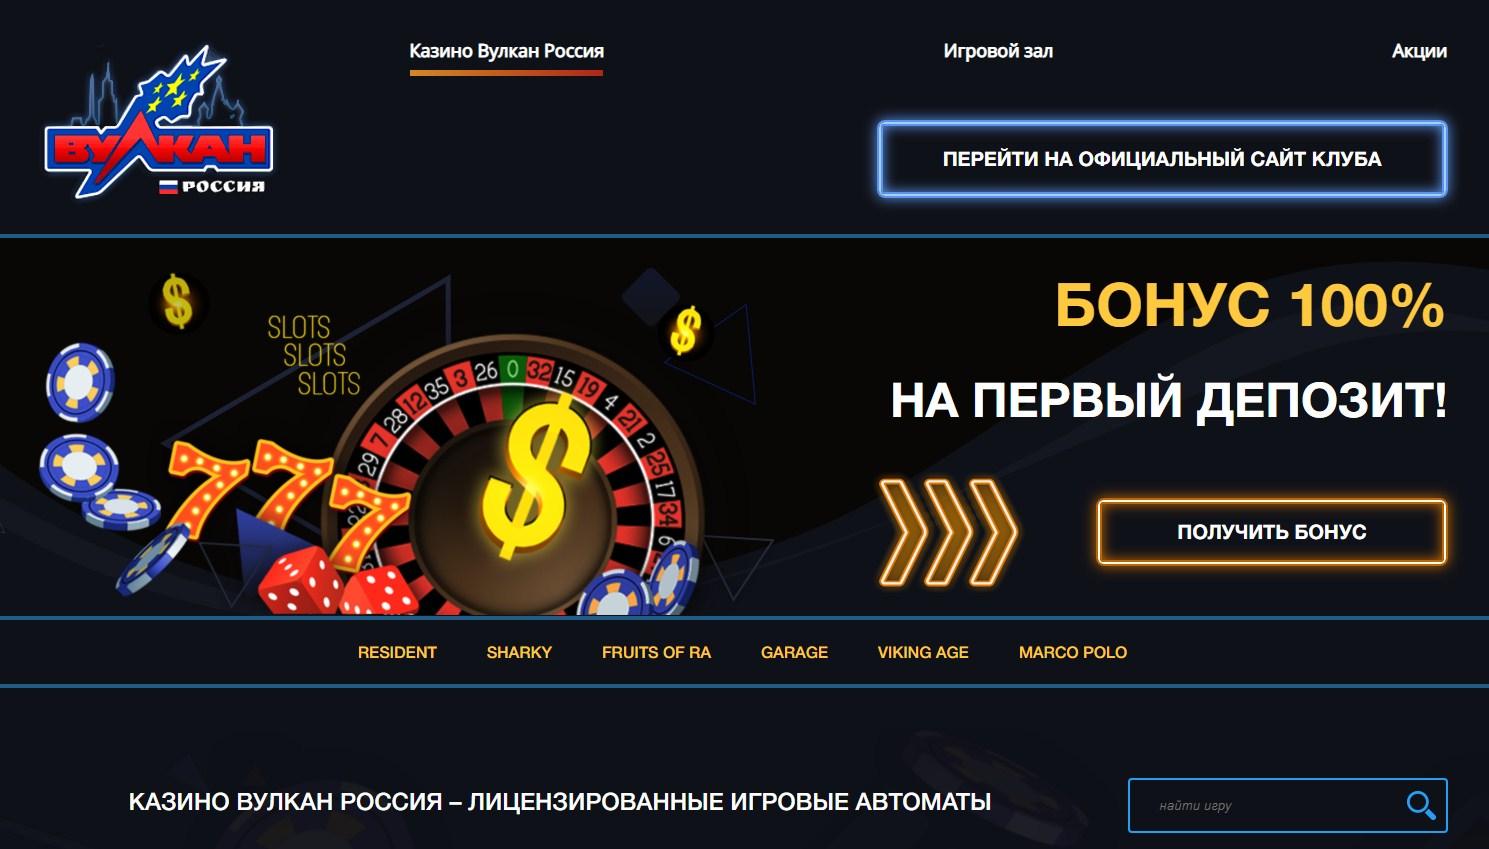 http://cazino-vulcanrussia.com/about-us/